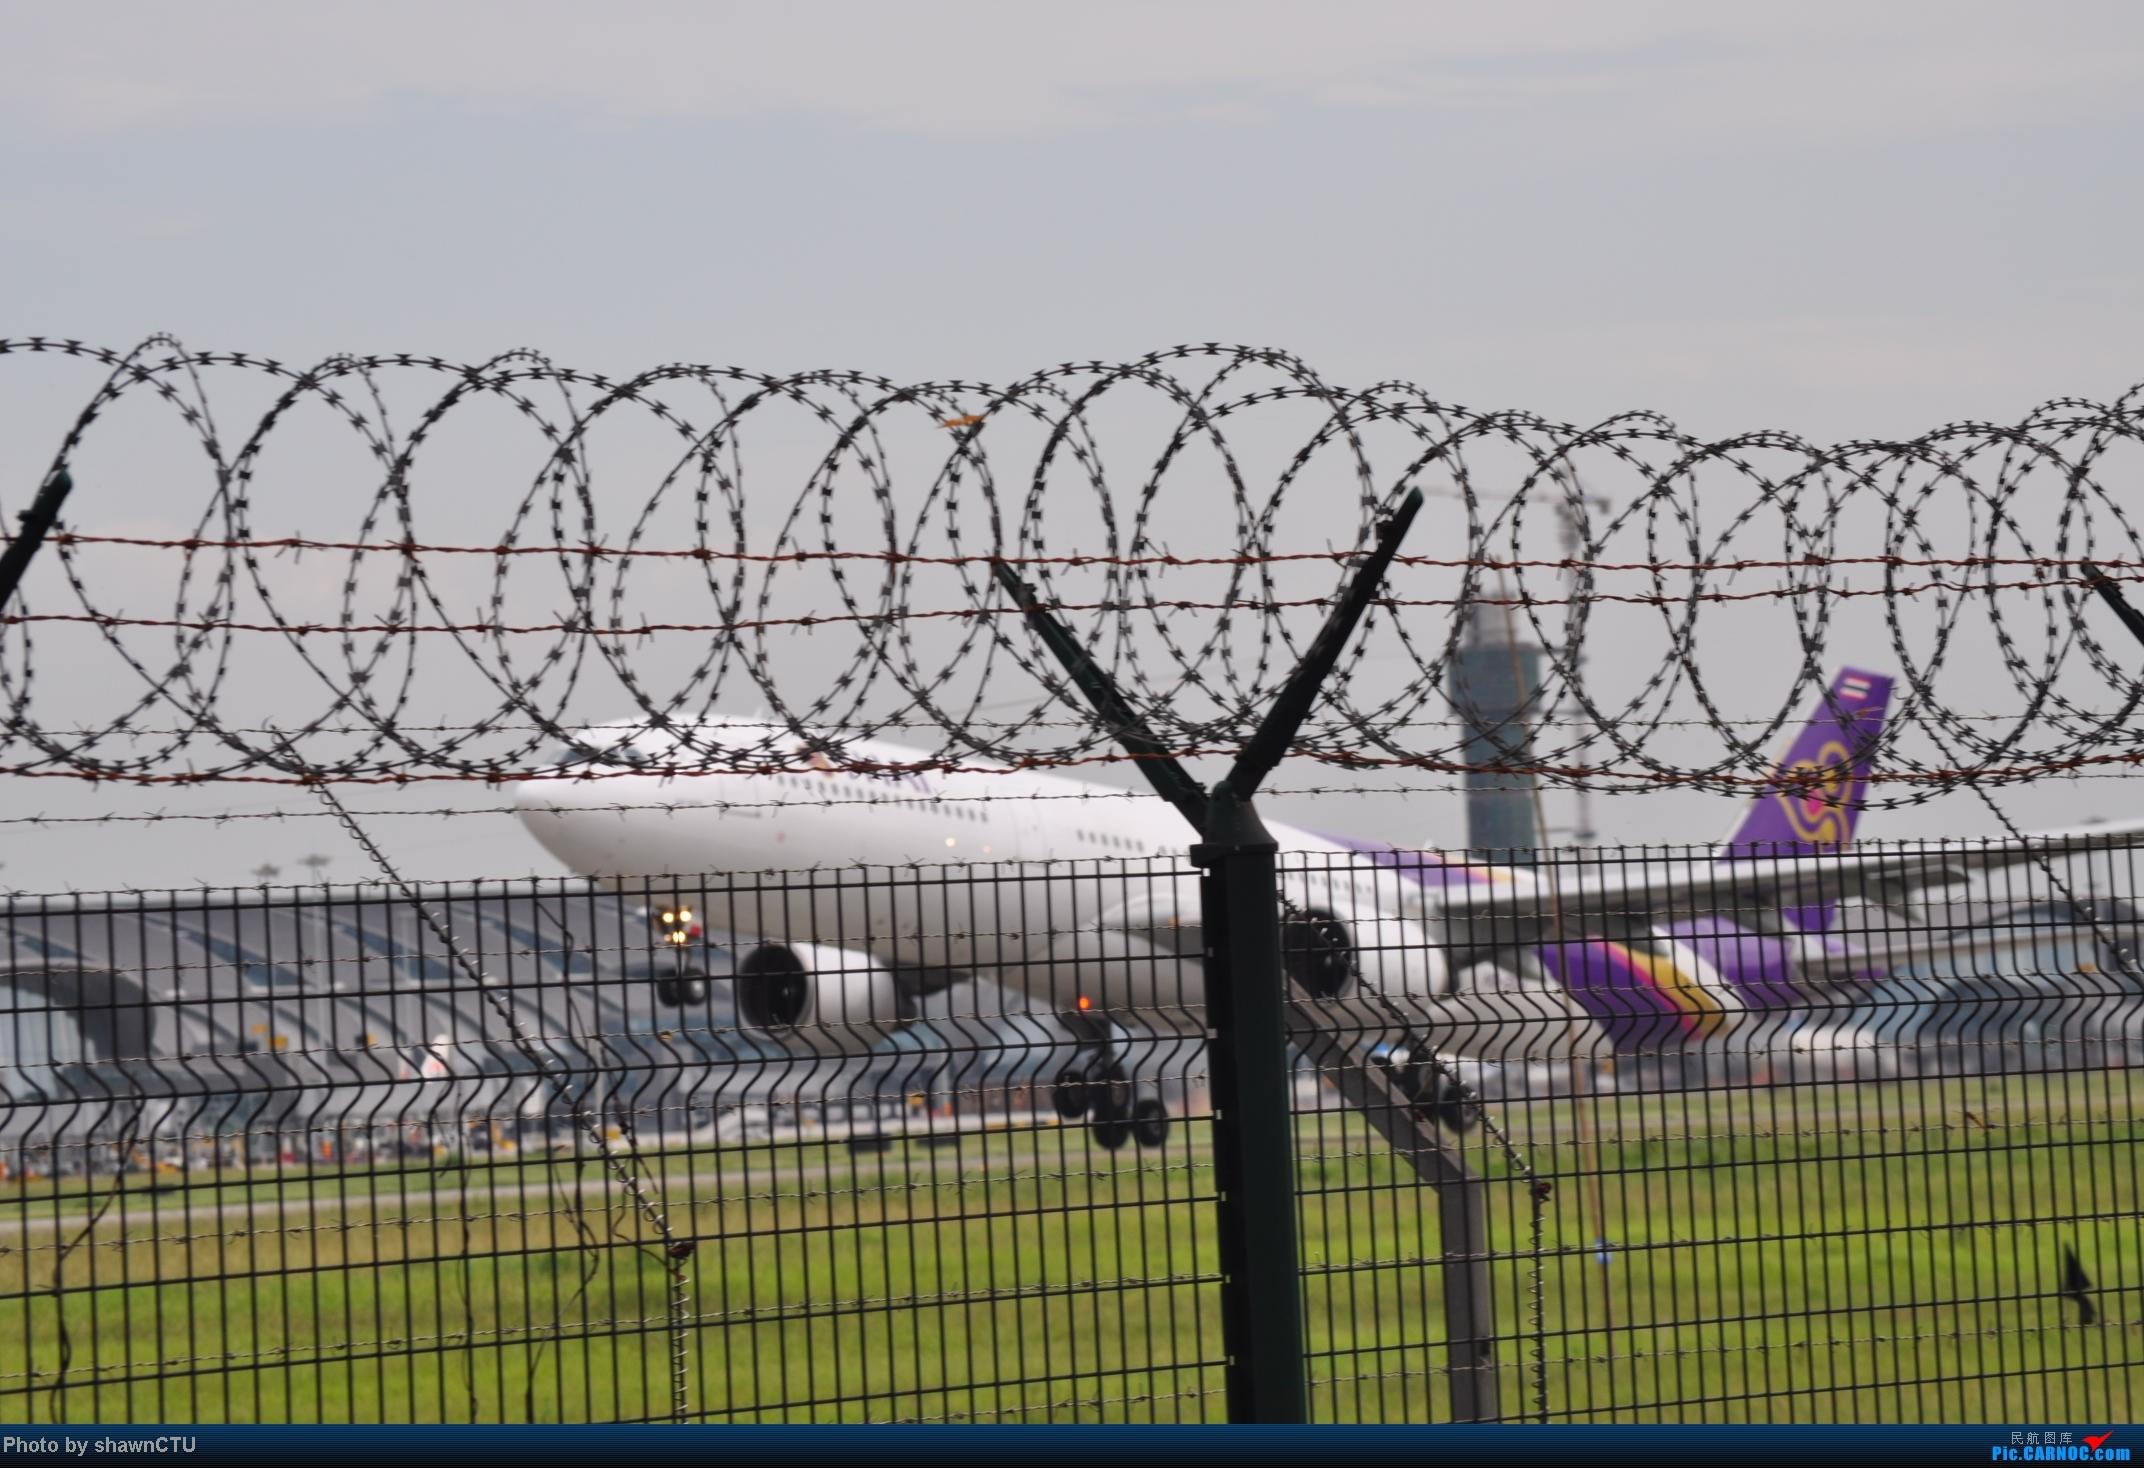 Re:[原创]2012年8月21日,双流西跑拍机。 AIRBUS A330-300 HS-TEN 中国成都双流机场